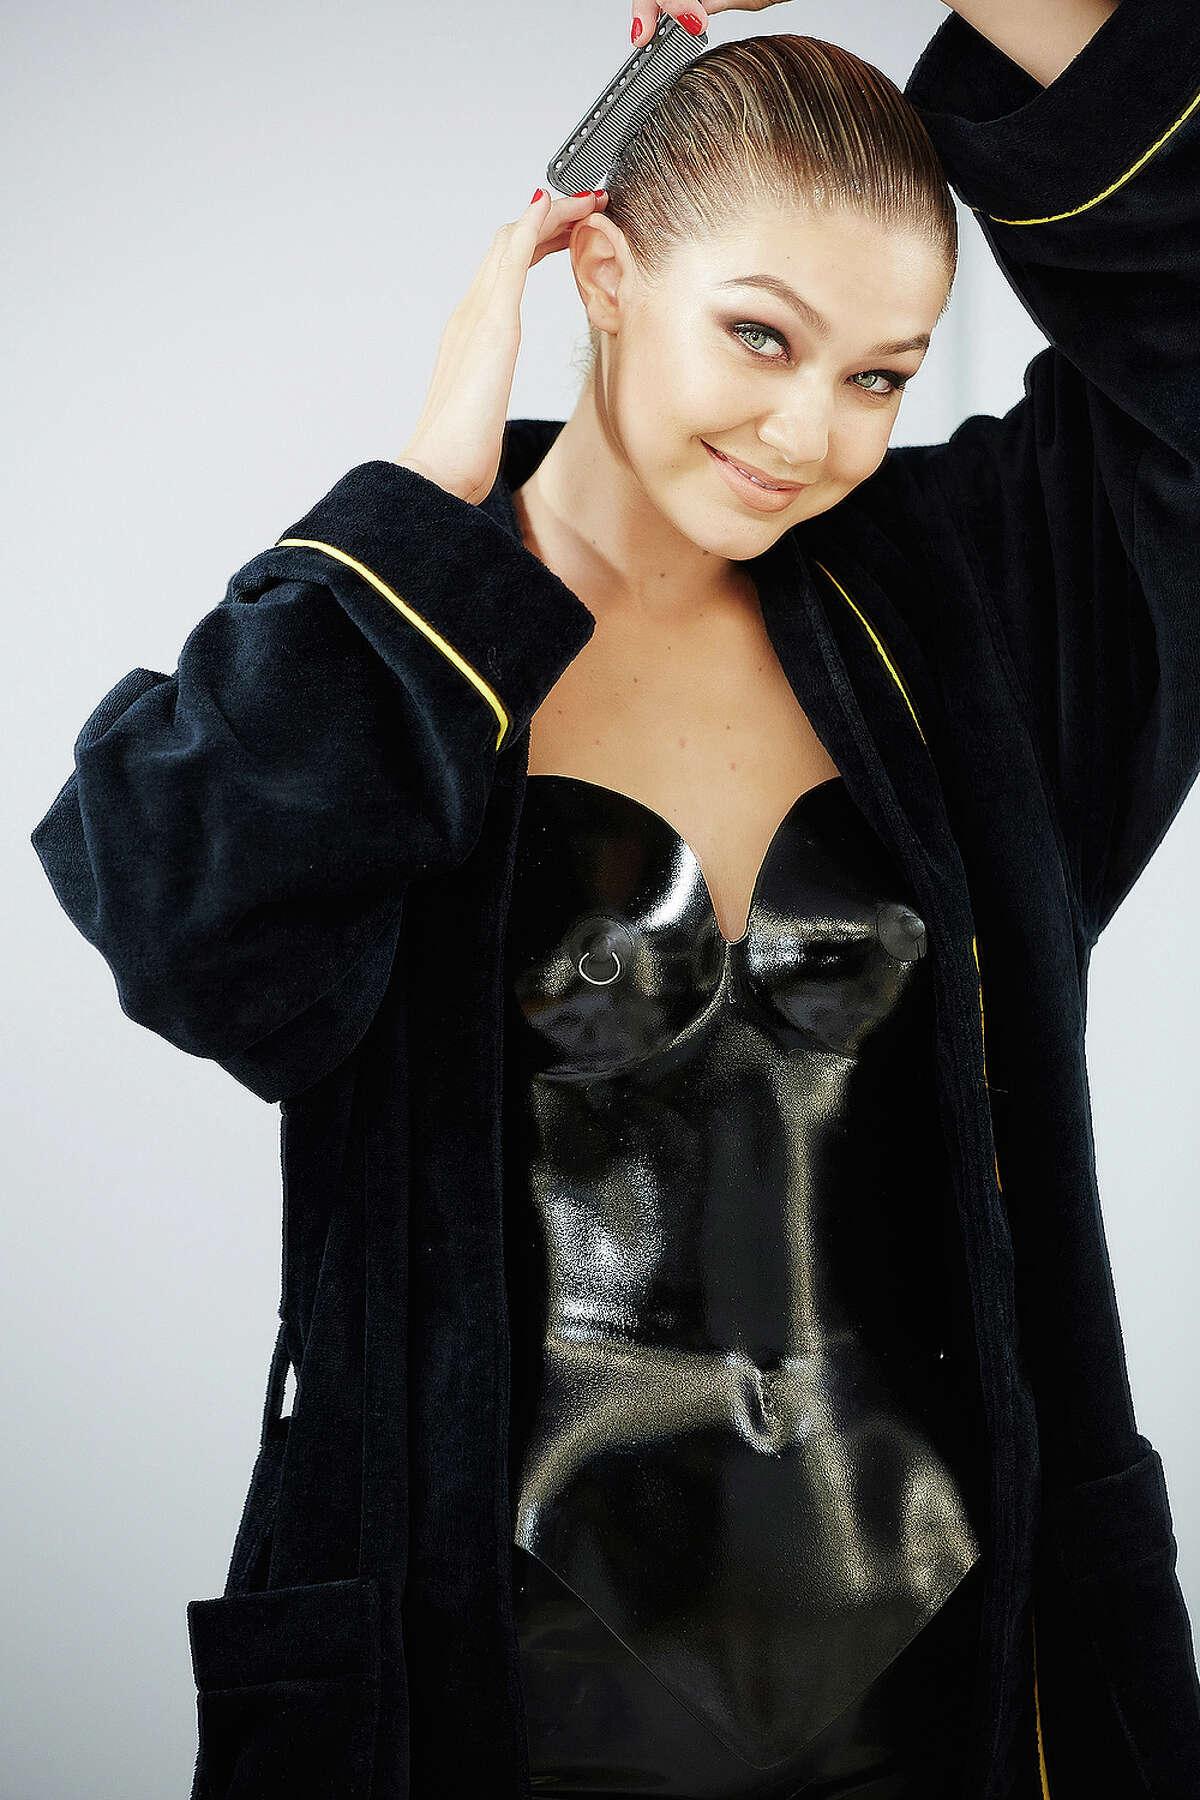 Gigi Hadid backstage on a shoot for Pirelli's